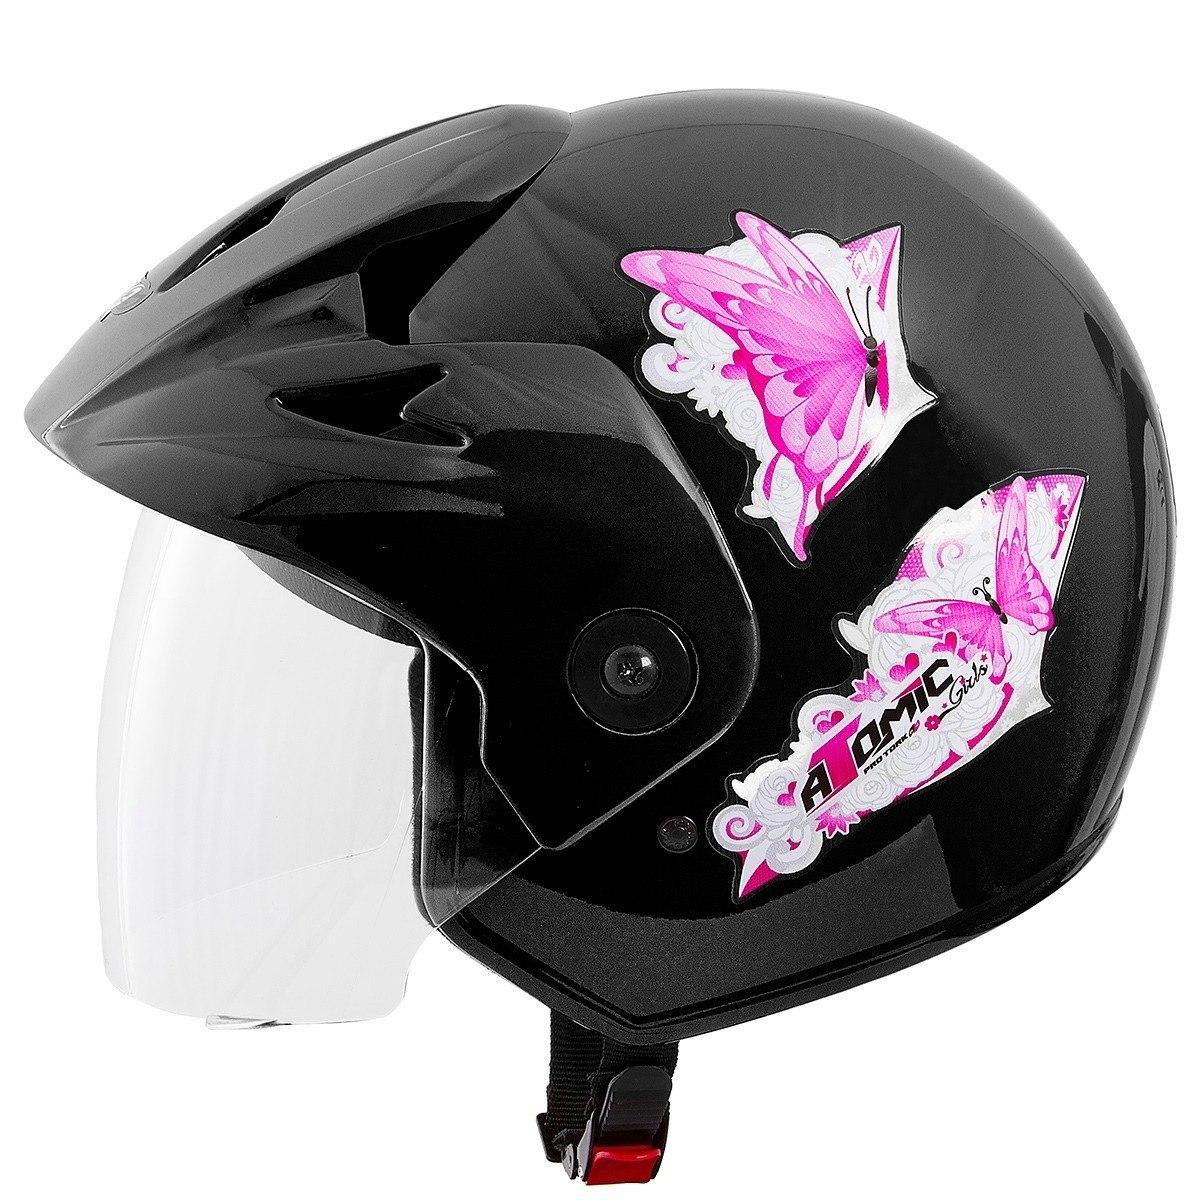 Capacete Moto Pro Tork 417 Atomic For Girls Preto Tm 58 - R  49 f82f6d68231